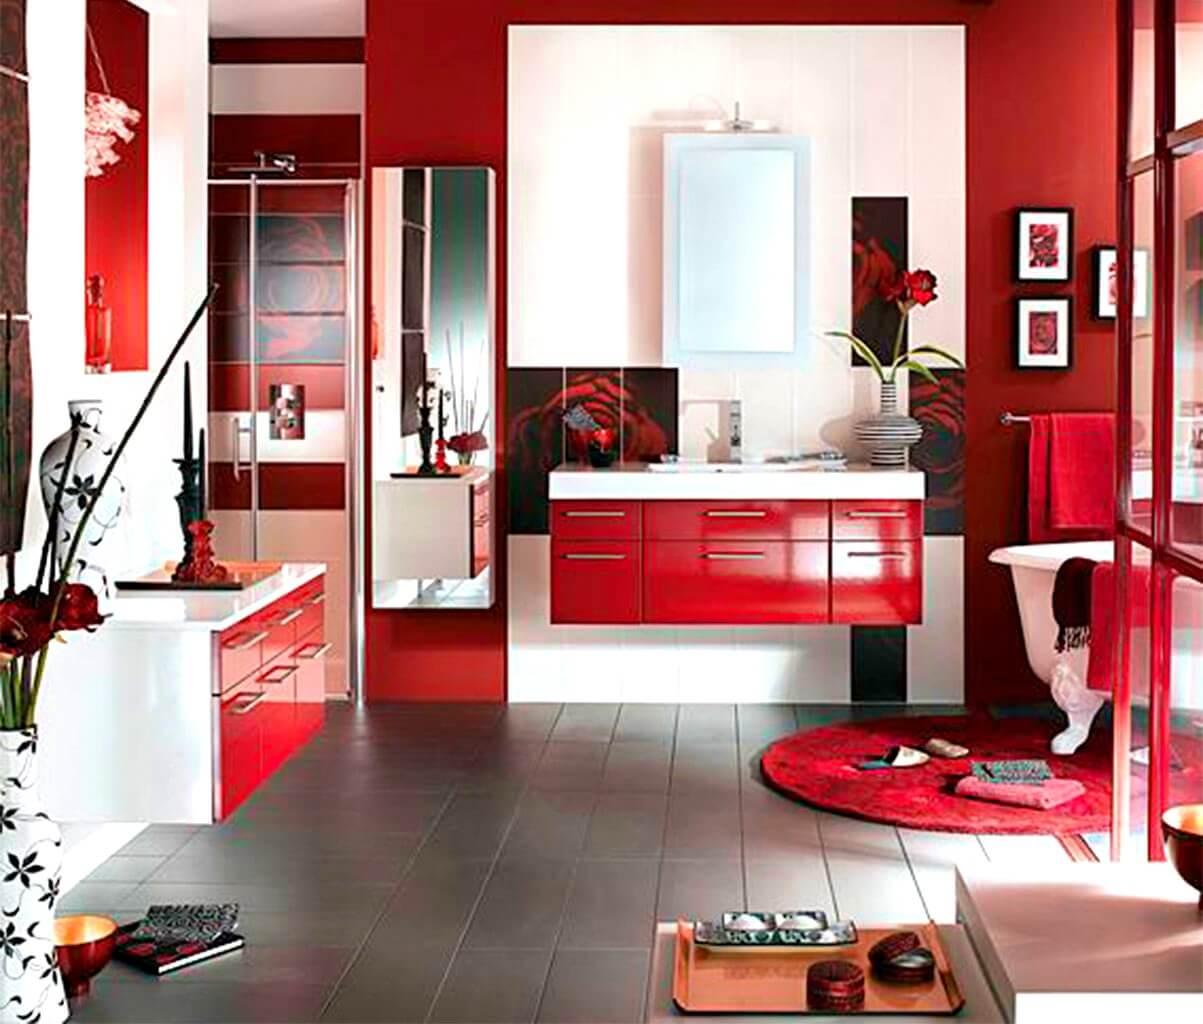 Wealthy red bathroom